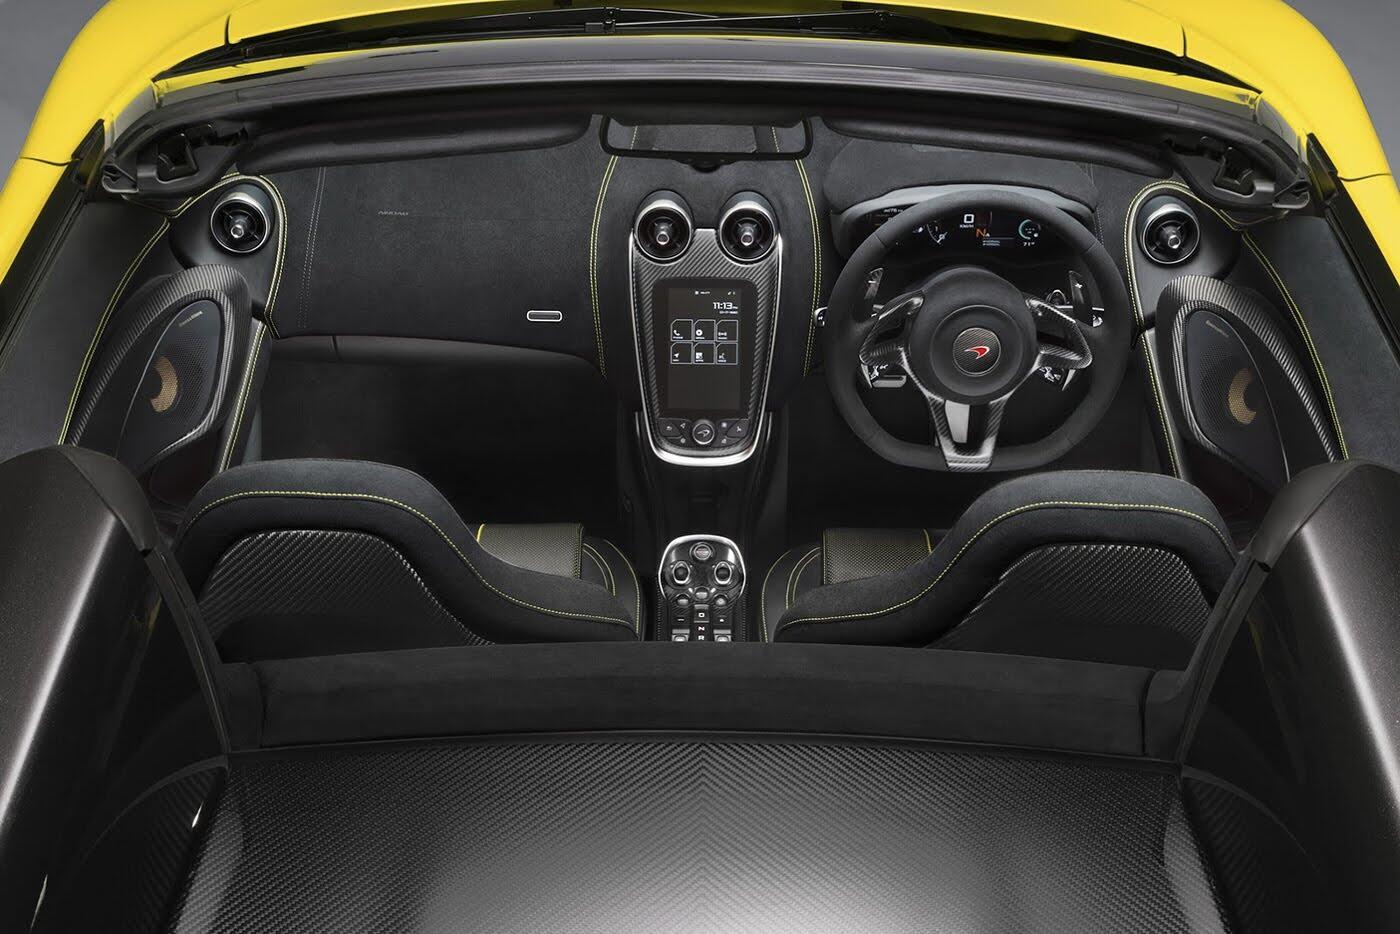 Siêu xe McLaren 570S Spider sắp ra mắt - Hình 11